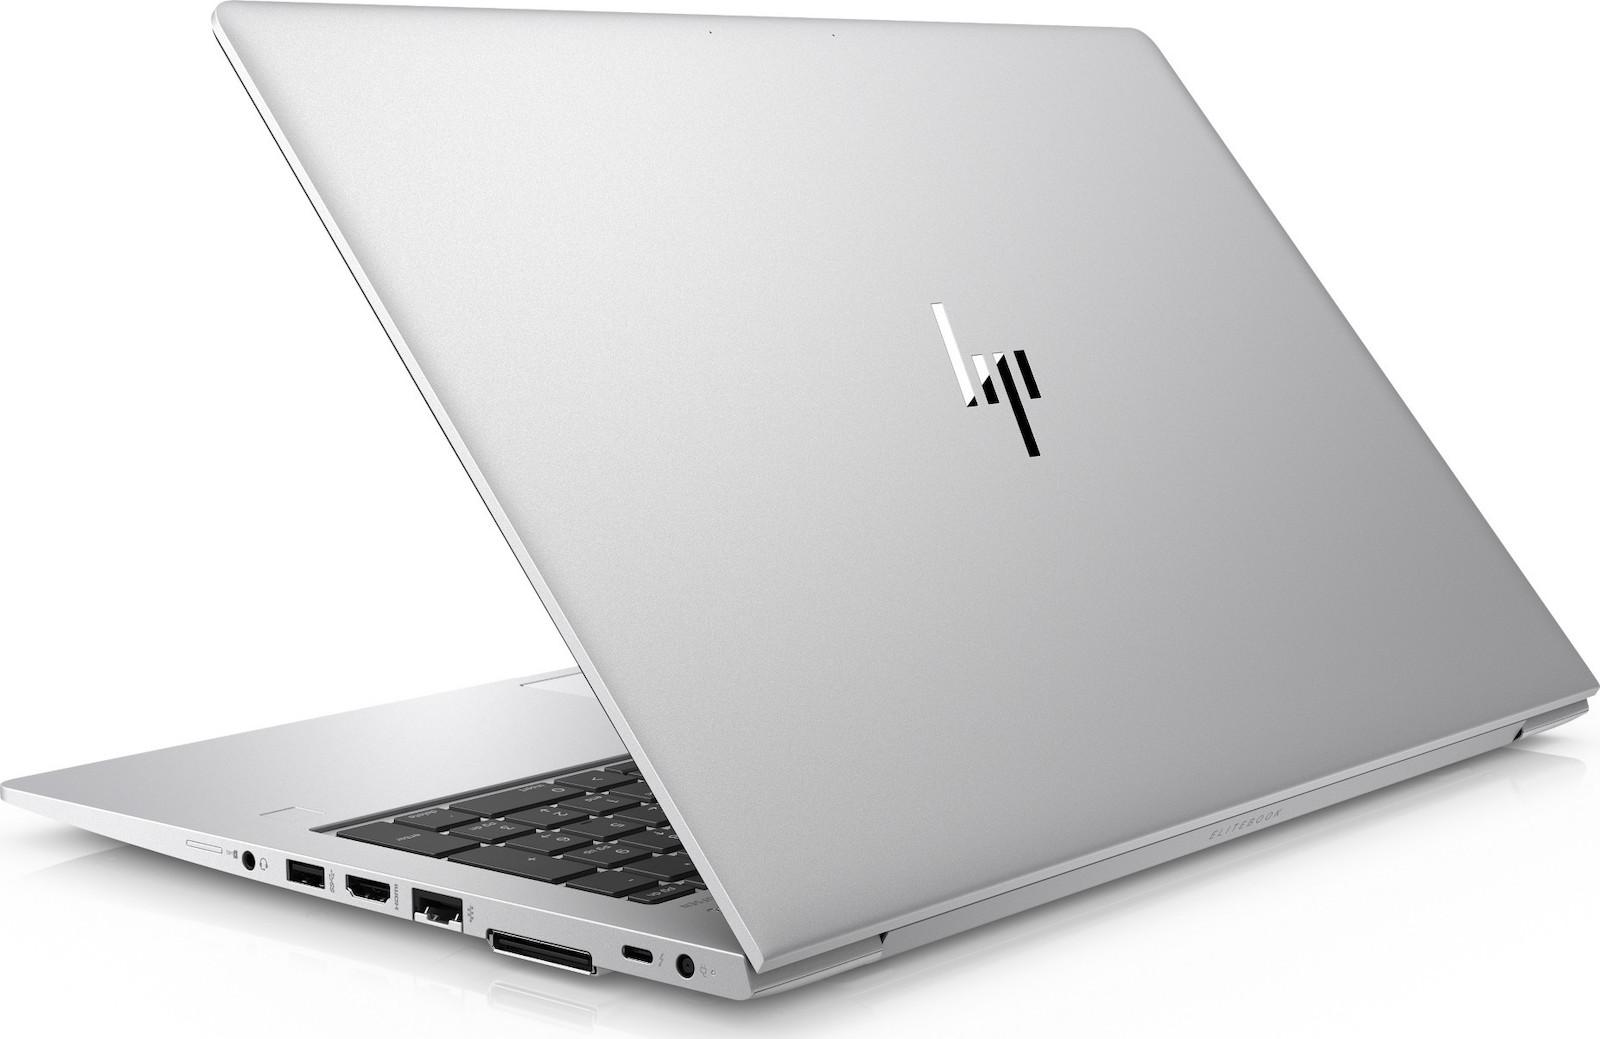 EliteBook-850-G1